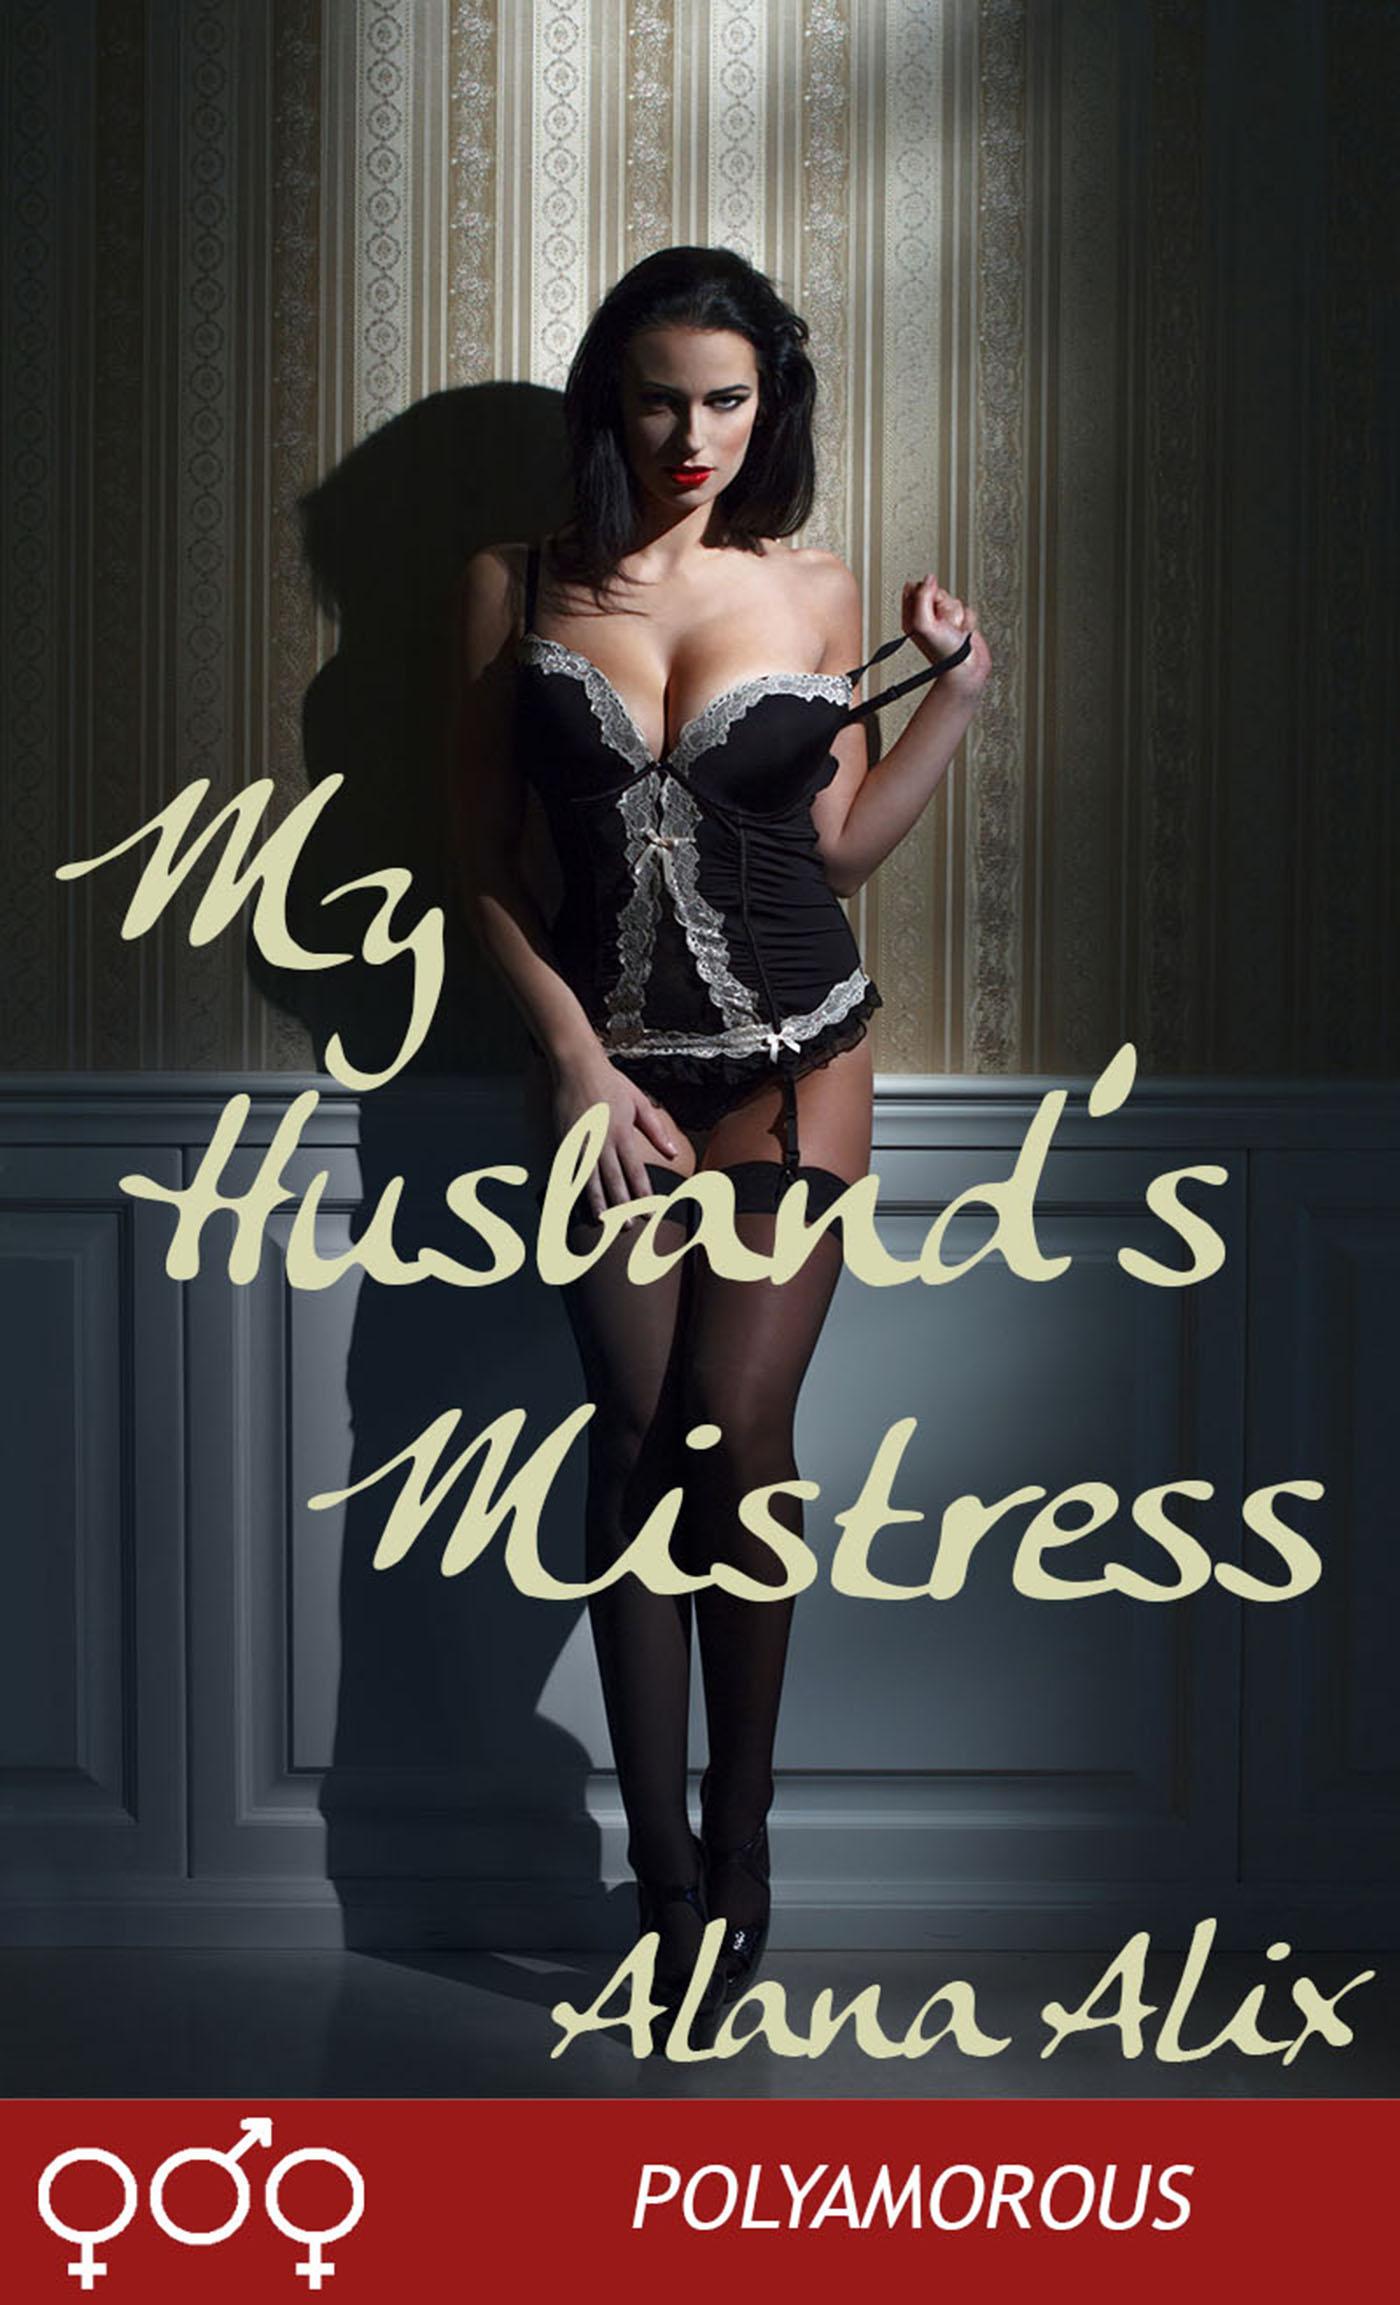 Alana Alix - My Husband's Mistress